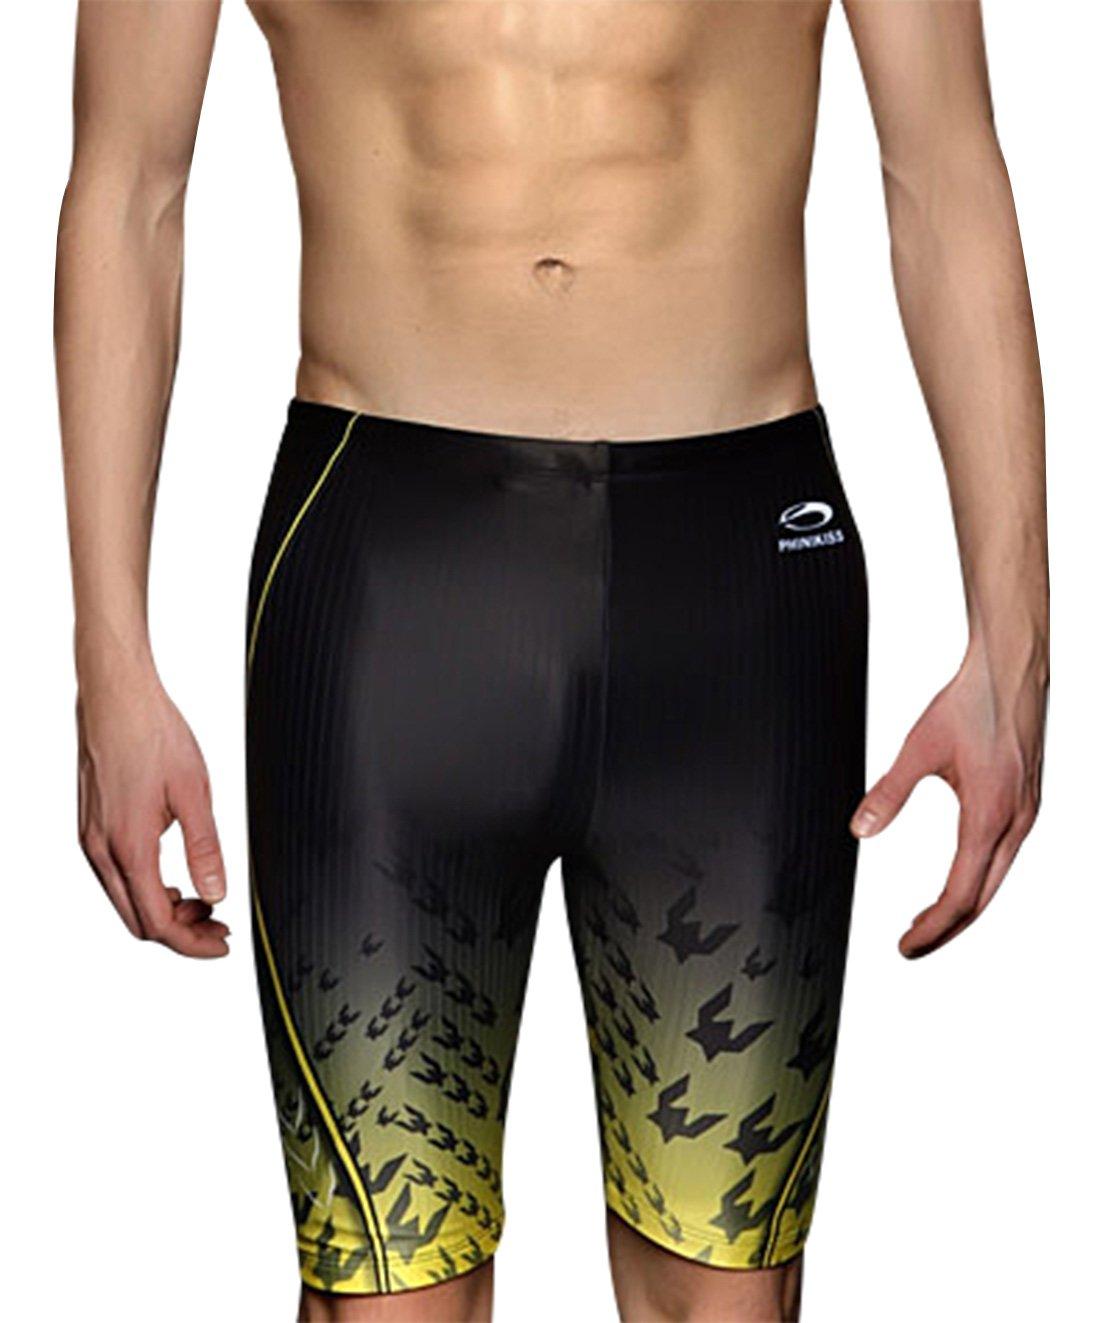 Phinikis Men's Swim Jammer Block UV Rays Outdoor Sports Racing Boxer Briefs Swimming Shorts 38 Yellow